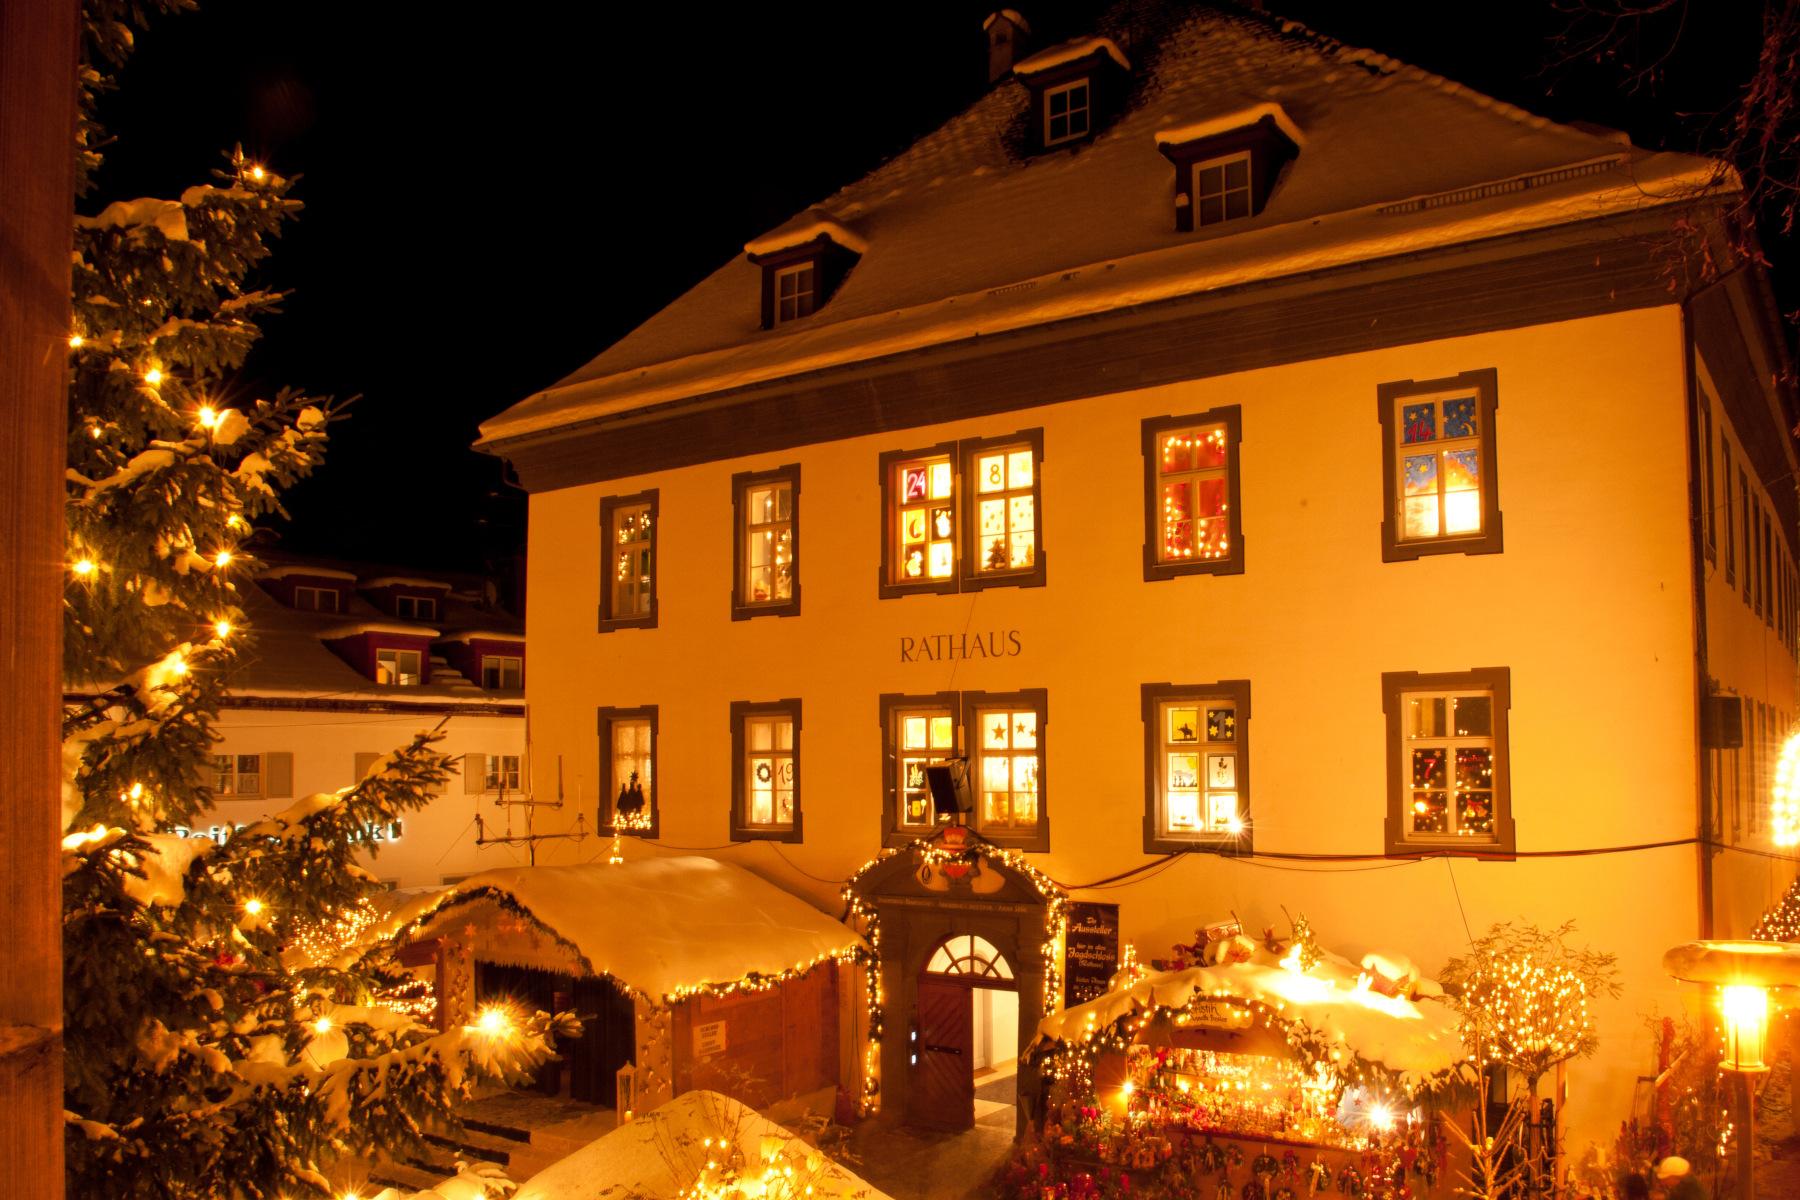 Bad Hindelang Weihnachtsmarkt.Budenzauber In Bad Hindelang Profil Magazin